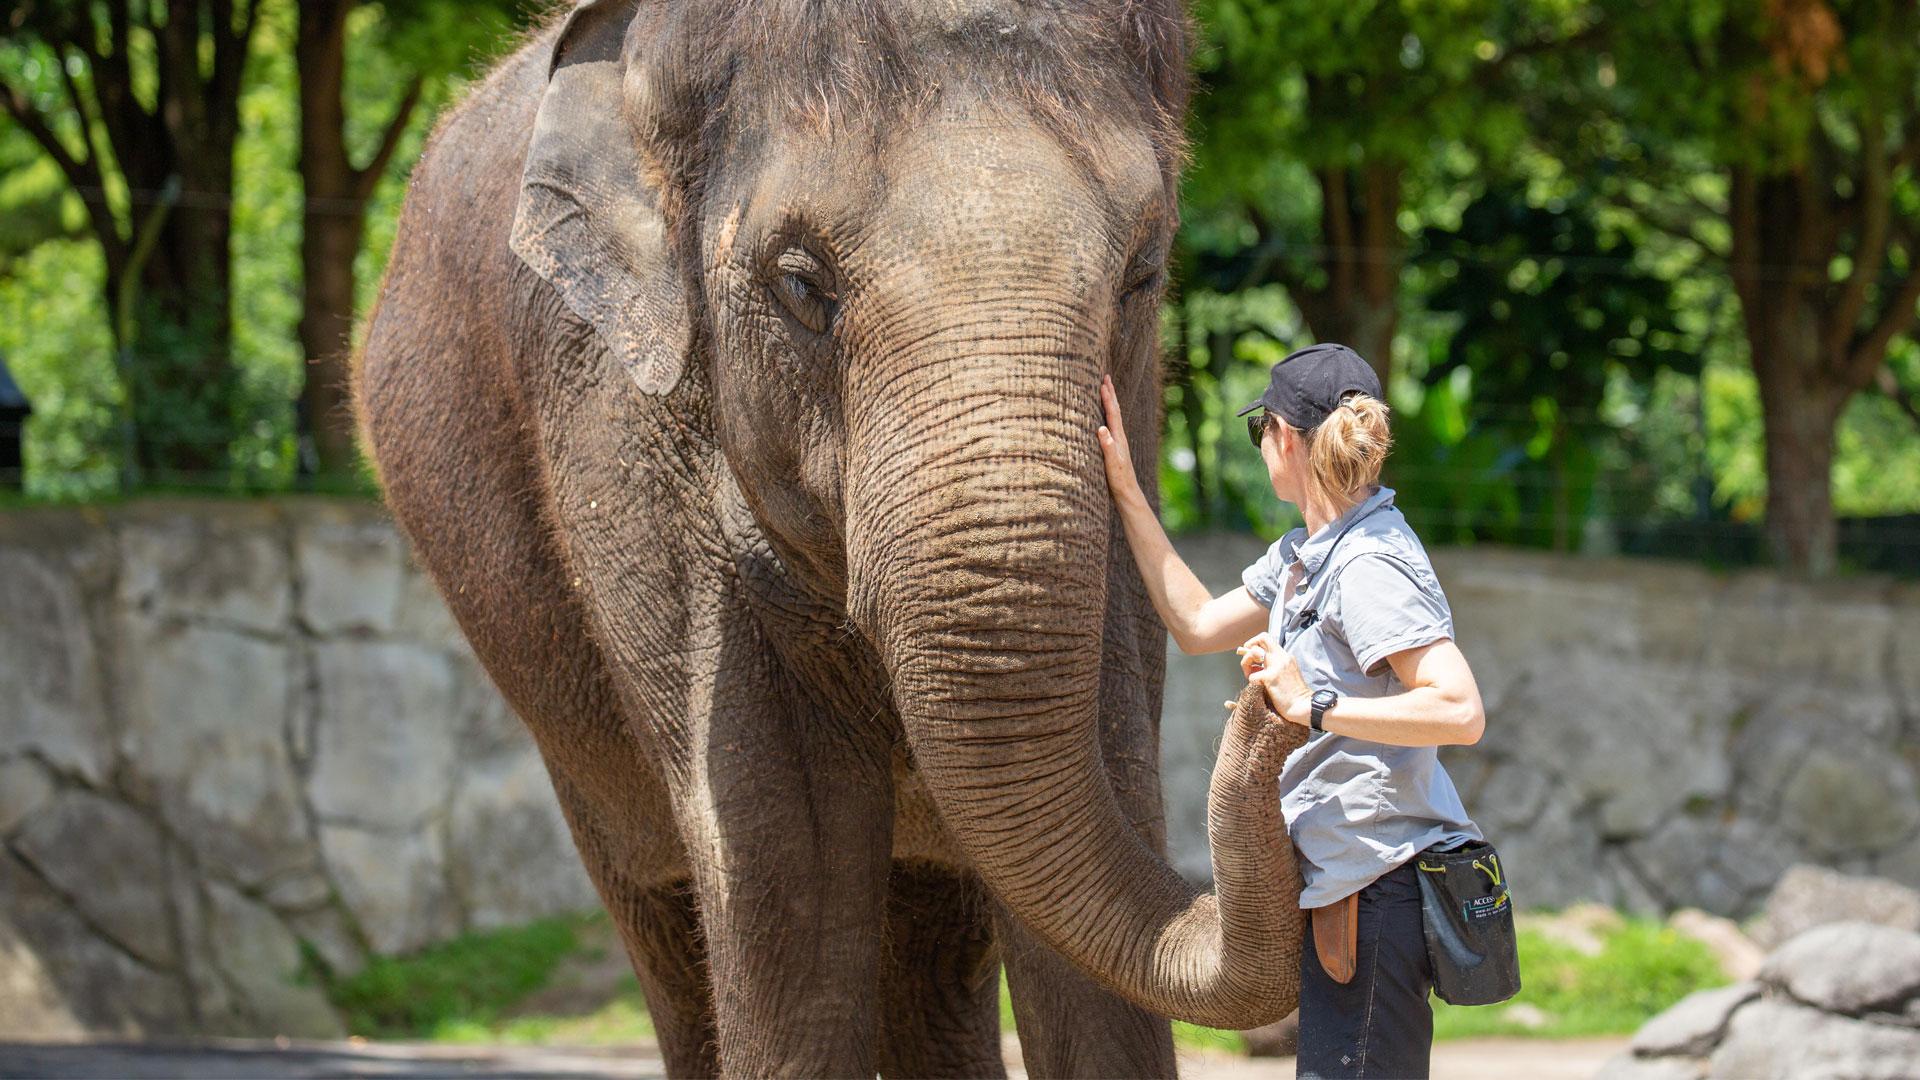 https://rfacdn.nz/zoo/assets/media/elephant-news-gallery-8.jpg